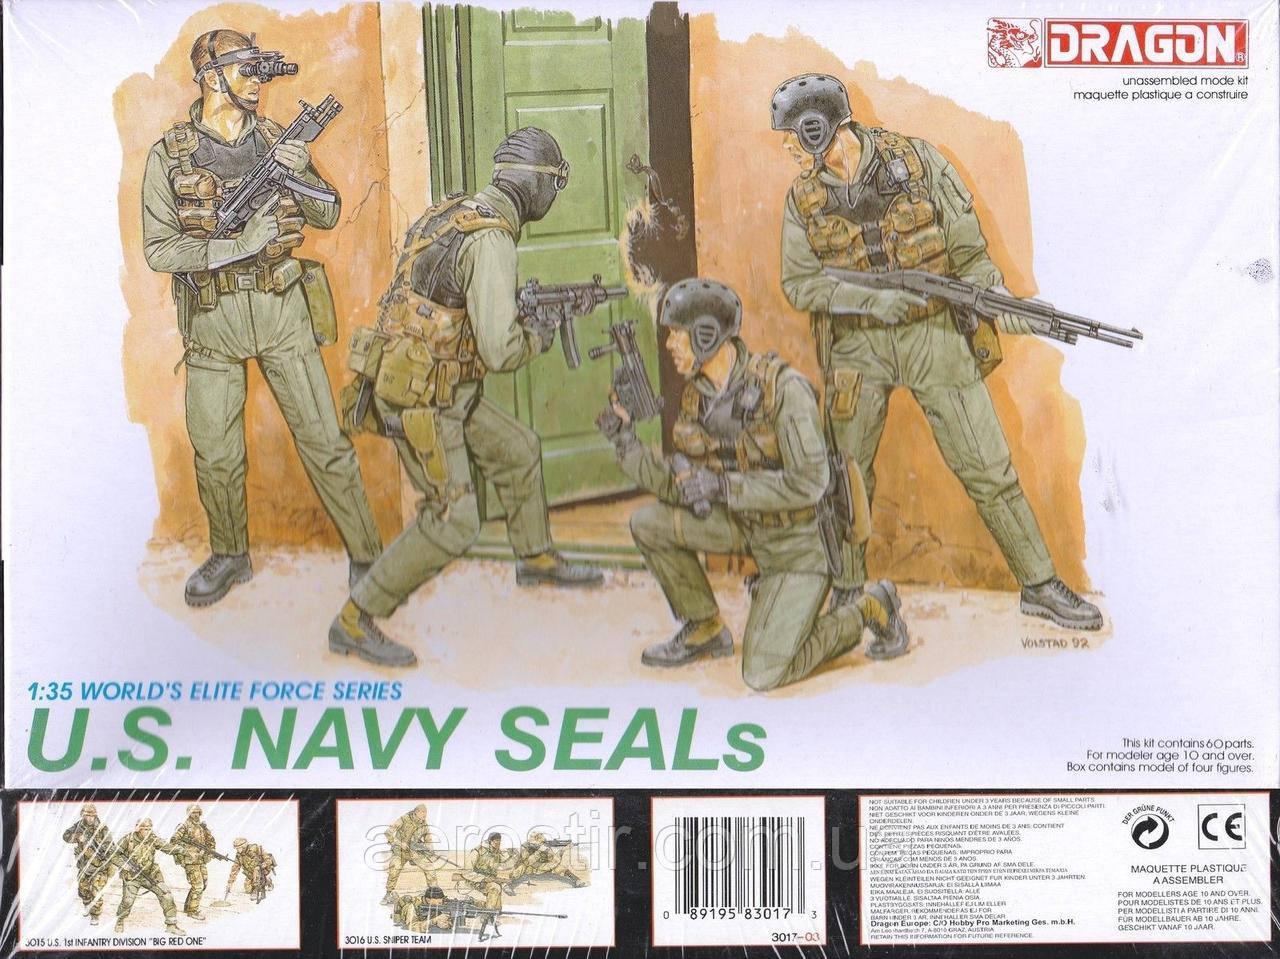 U.S. Navy Seals 1/35 Dragon 3017